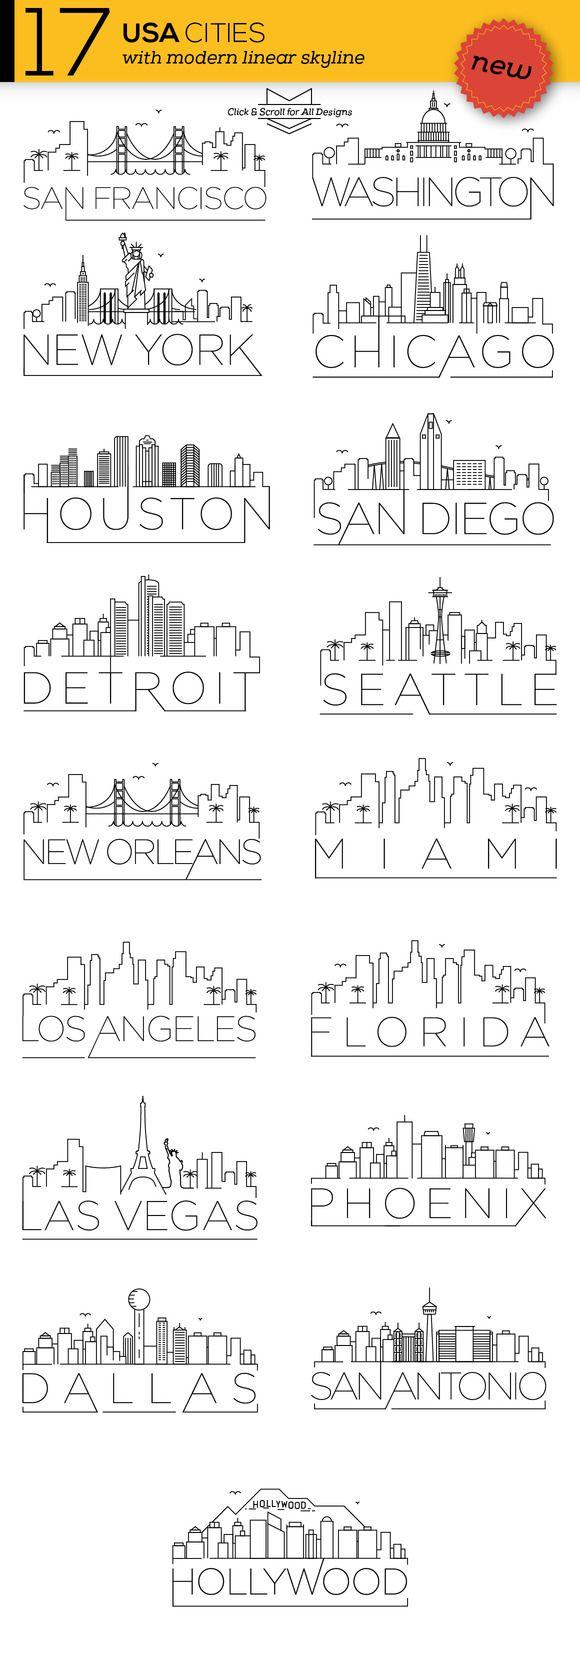 Dallas Skyline Tattoo Designs : dallas, skyline, tattoo, designs, Linear, Skylines, Lettering,, Sketch, Book,, Travel, Journal